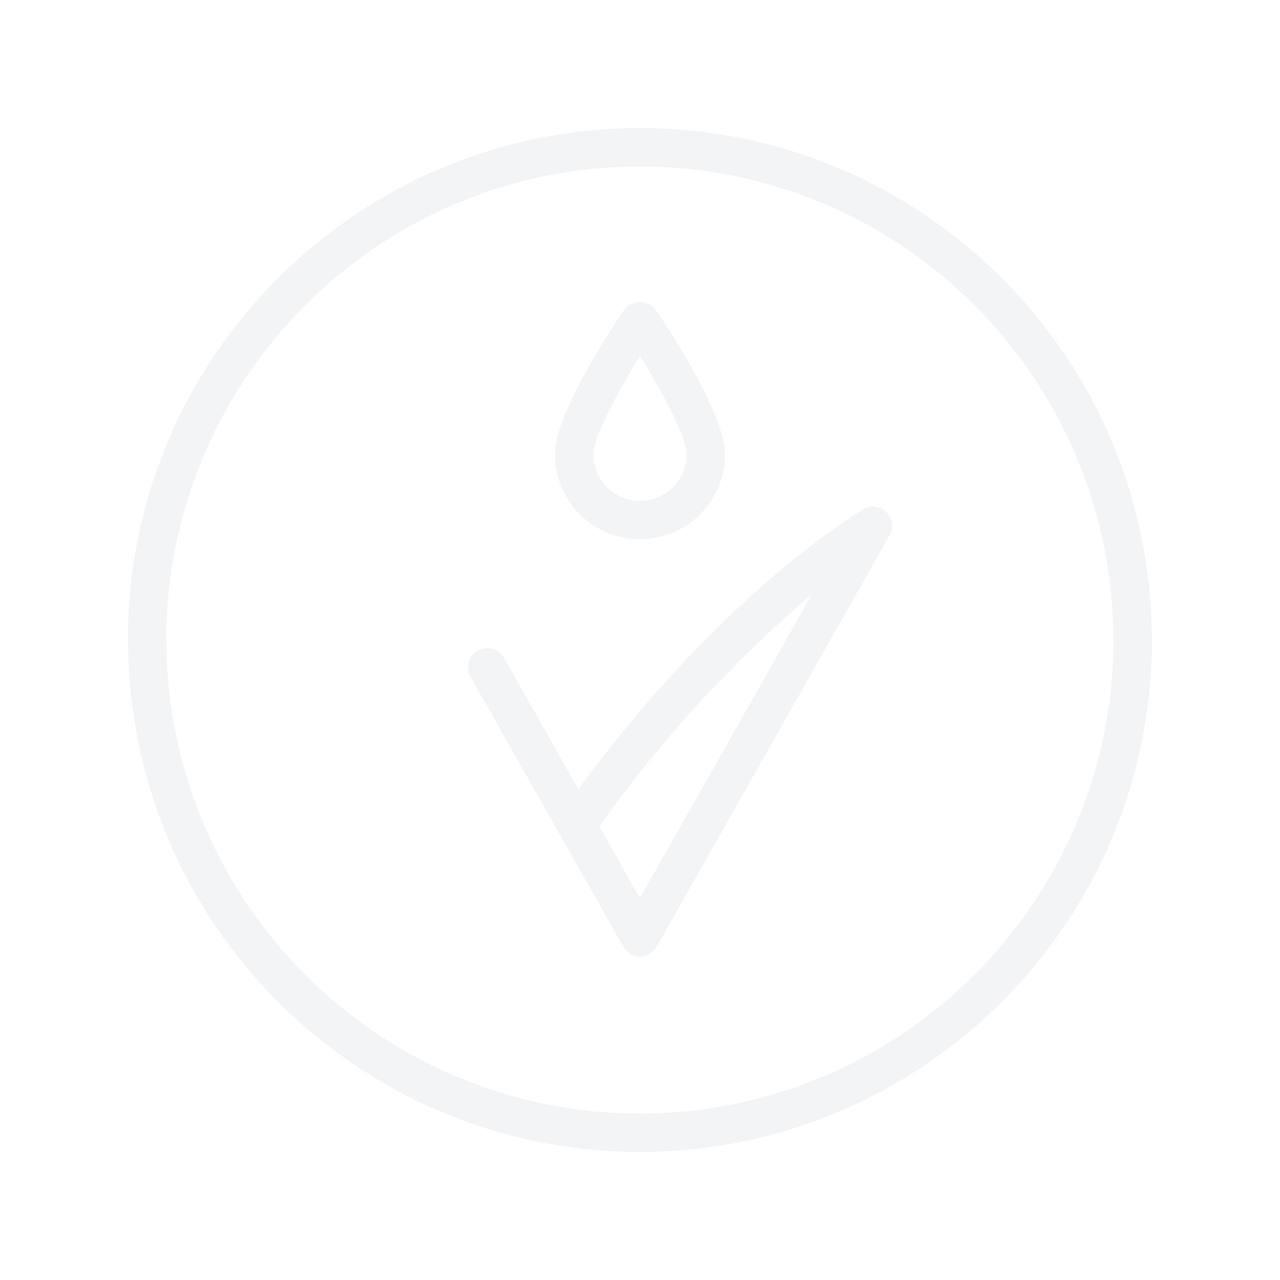 MOROCCANOIL Luminous Extra Strong Hairspray 330ml